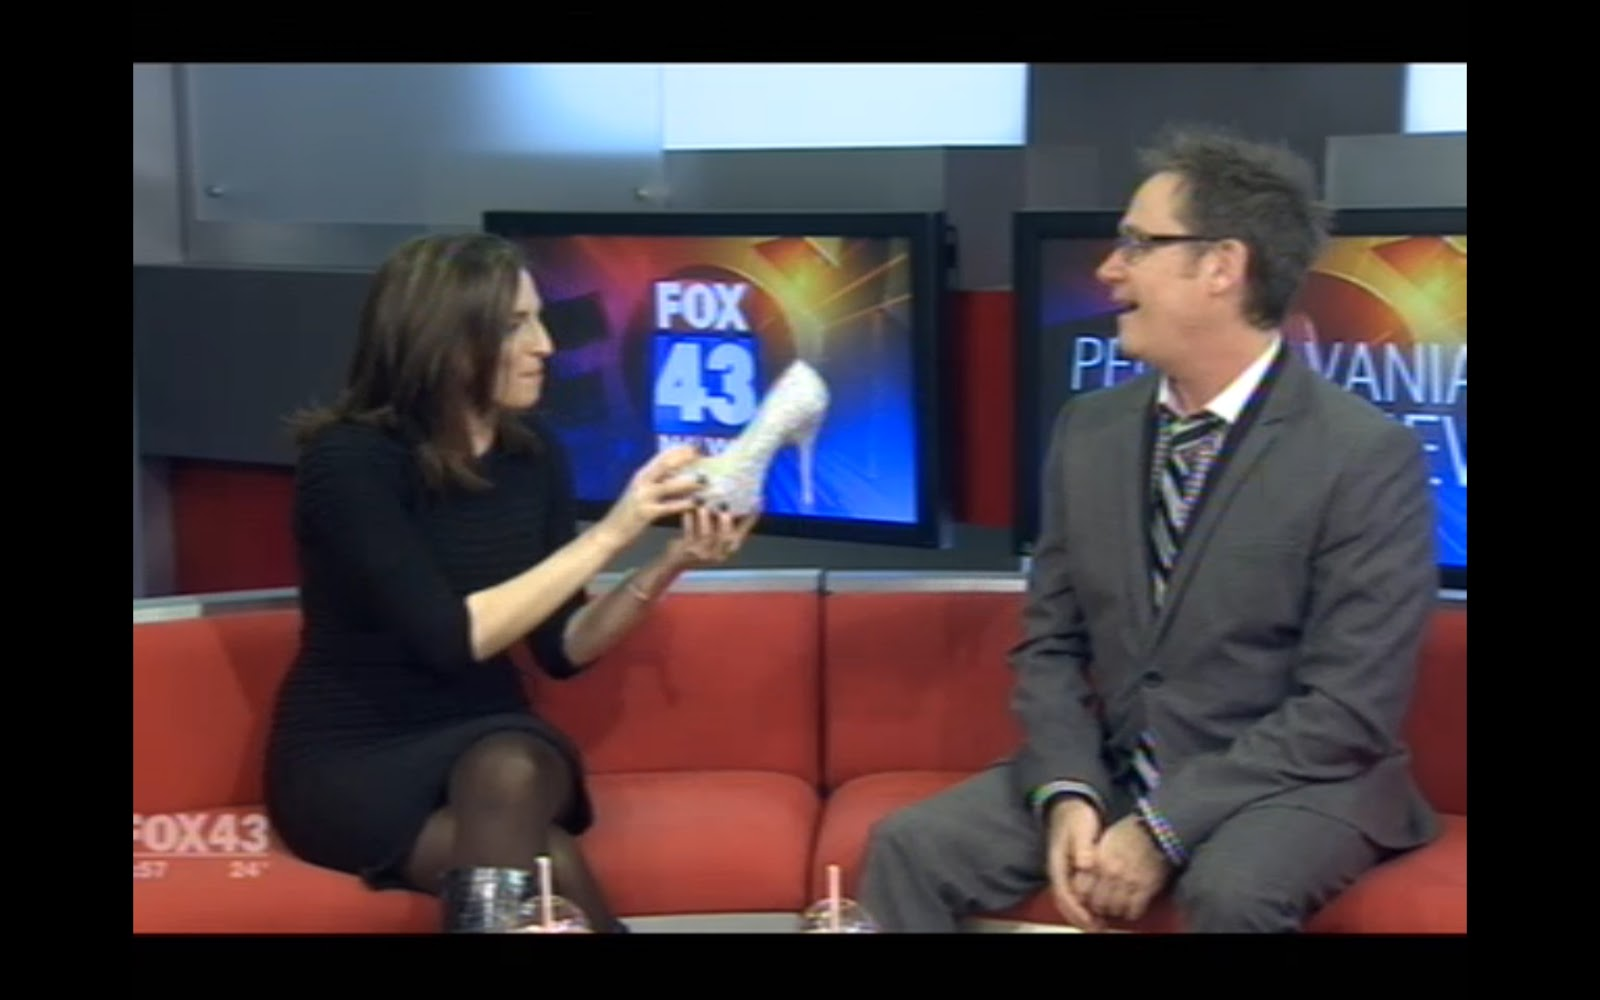 Fox 43 News York PA Anchors